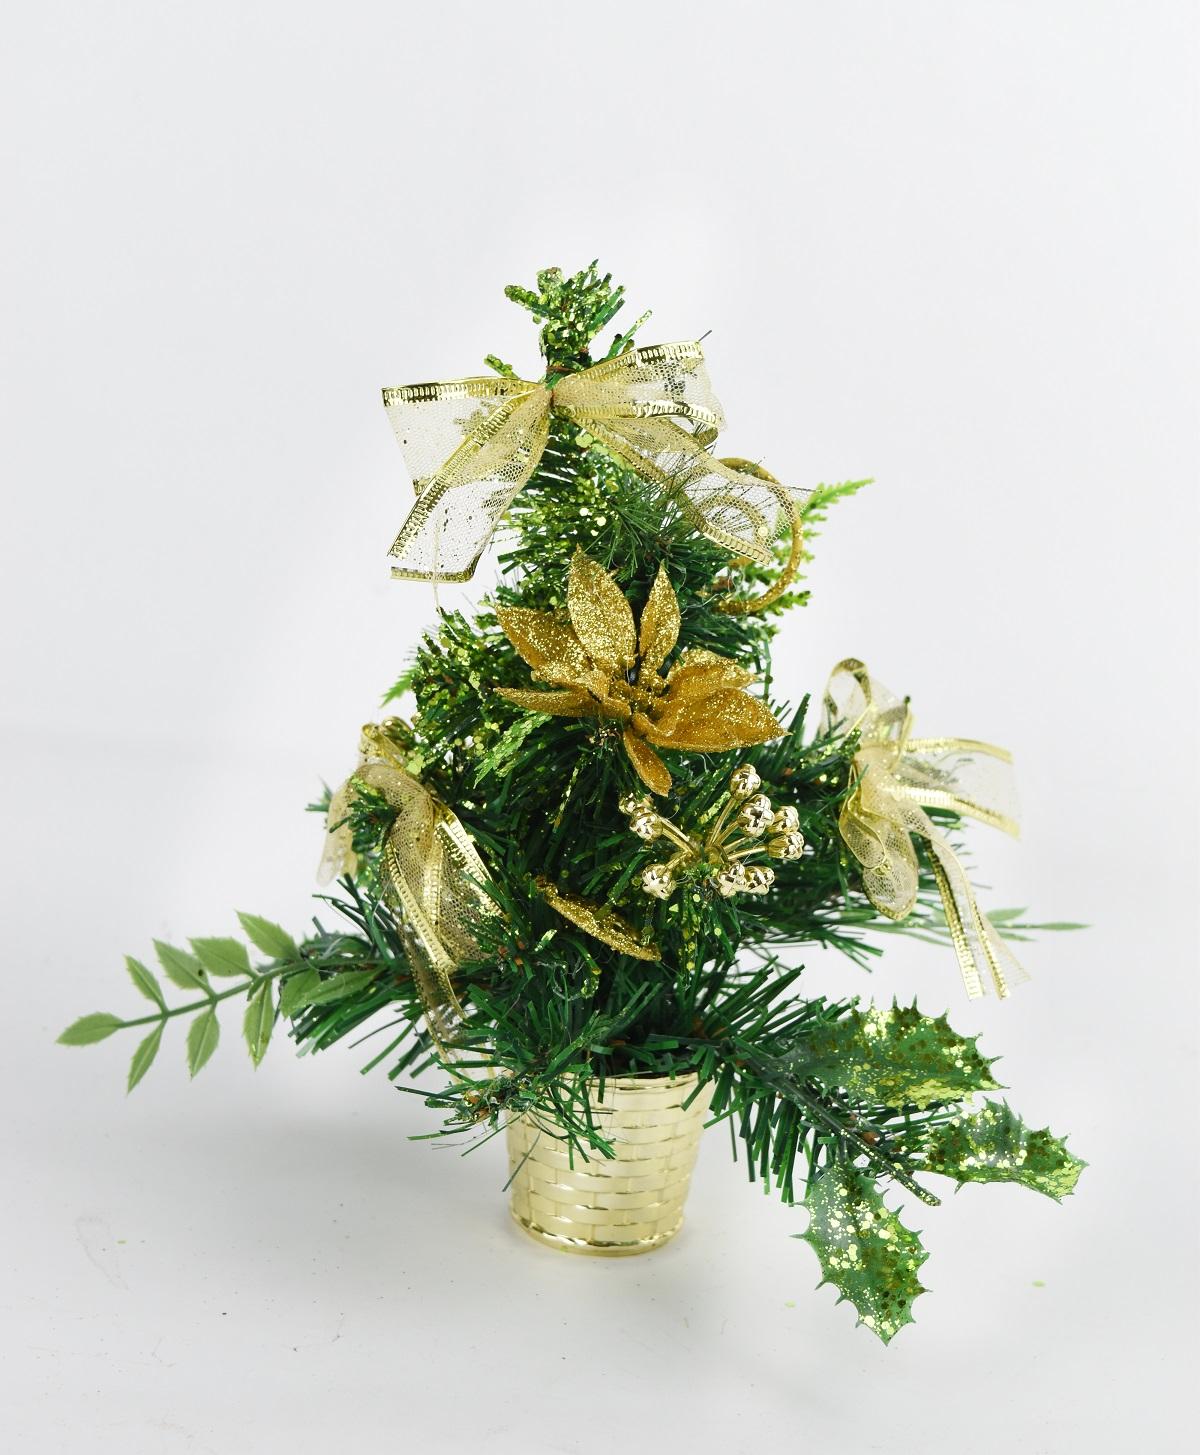 X射線【X454011】20cm裝飾聖誕樹(金),聖誕樹/聖誕佈置/聖誕燈/會場佈置/材料包/成品樹/小樹